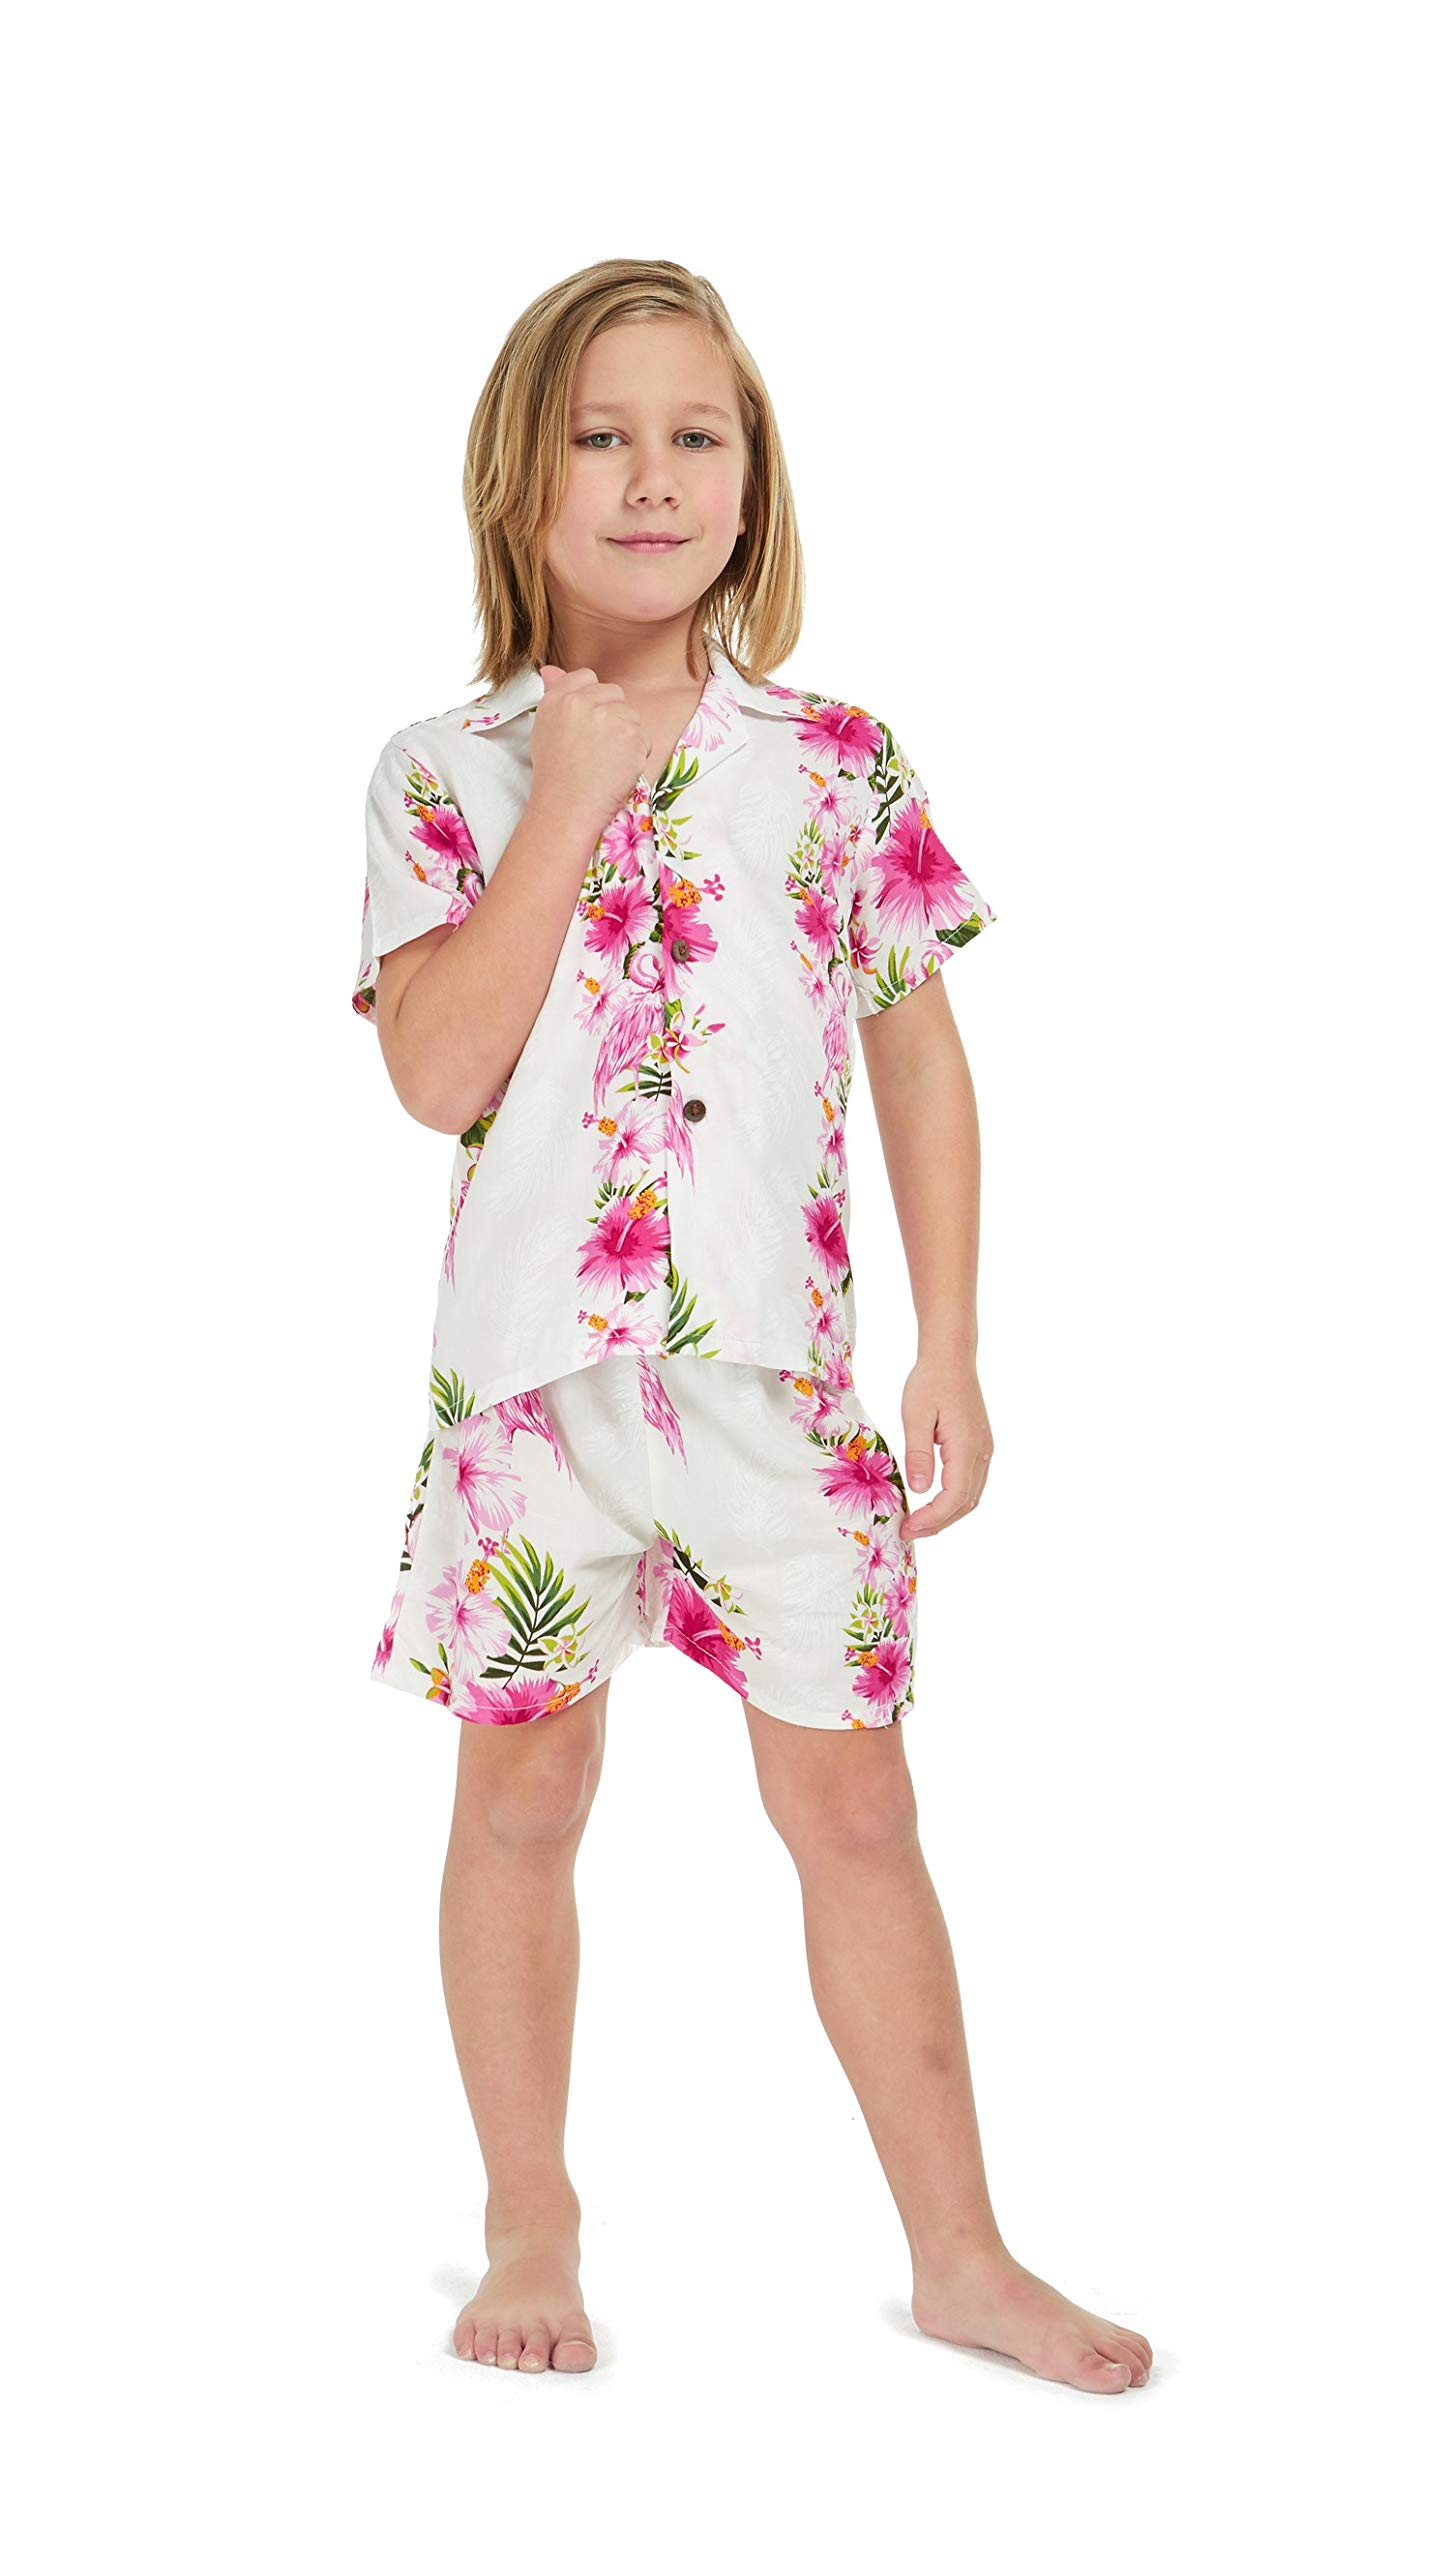 Hawaii Hangover Boy Young Adult Aloha Luau Shirt in Pink Hibiscus Vine 10 Year Old by Hawaii Hangover (Image #6)